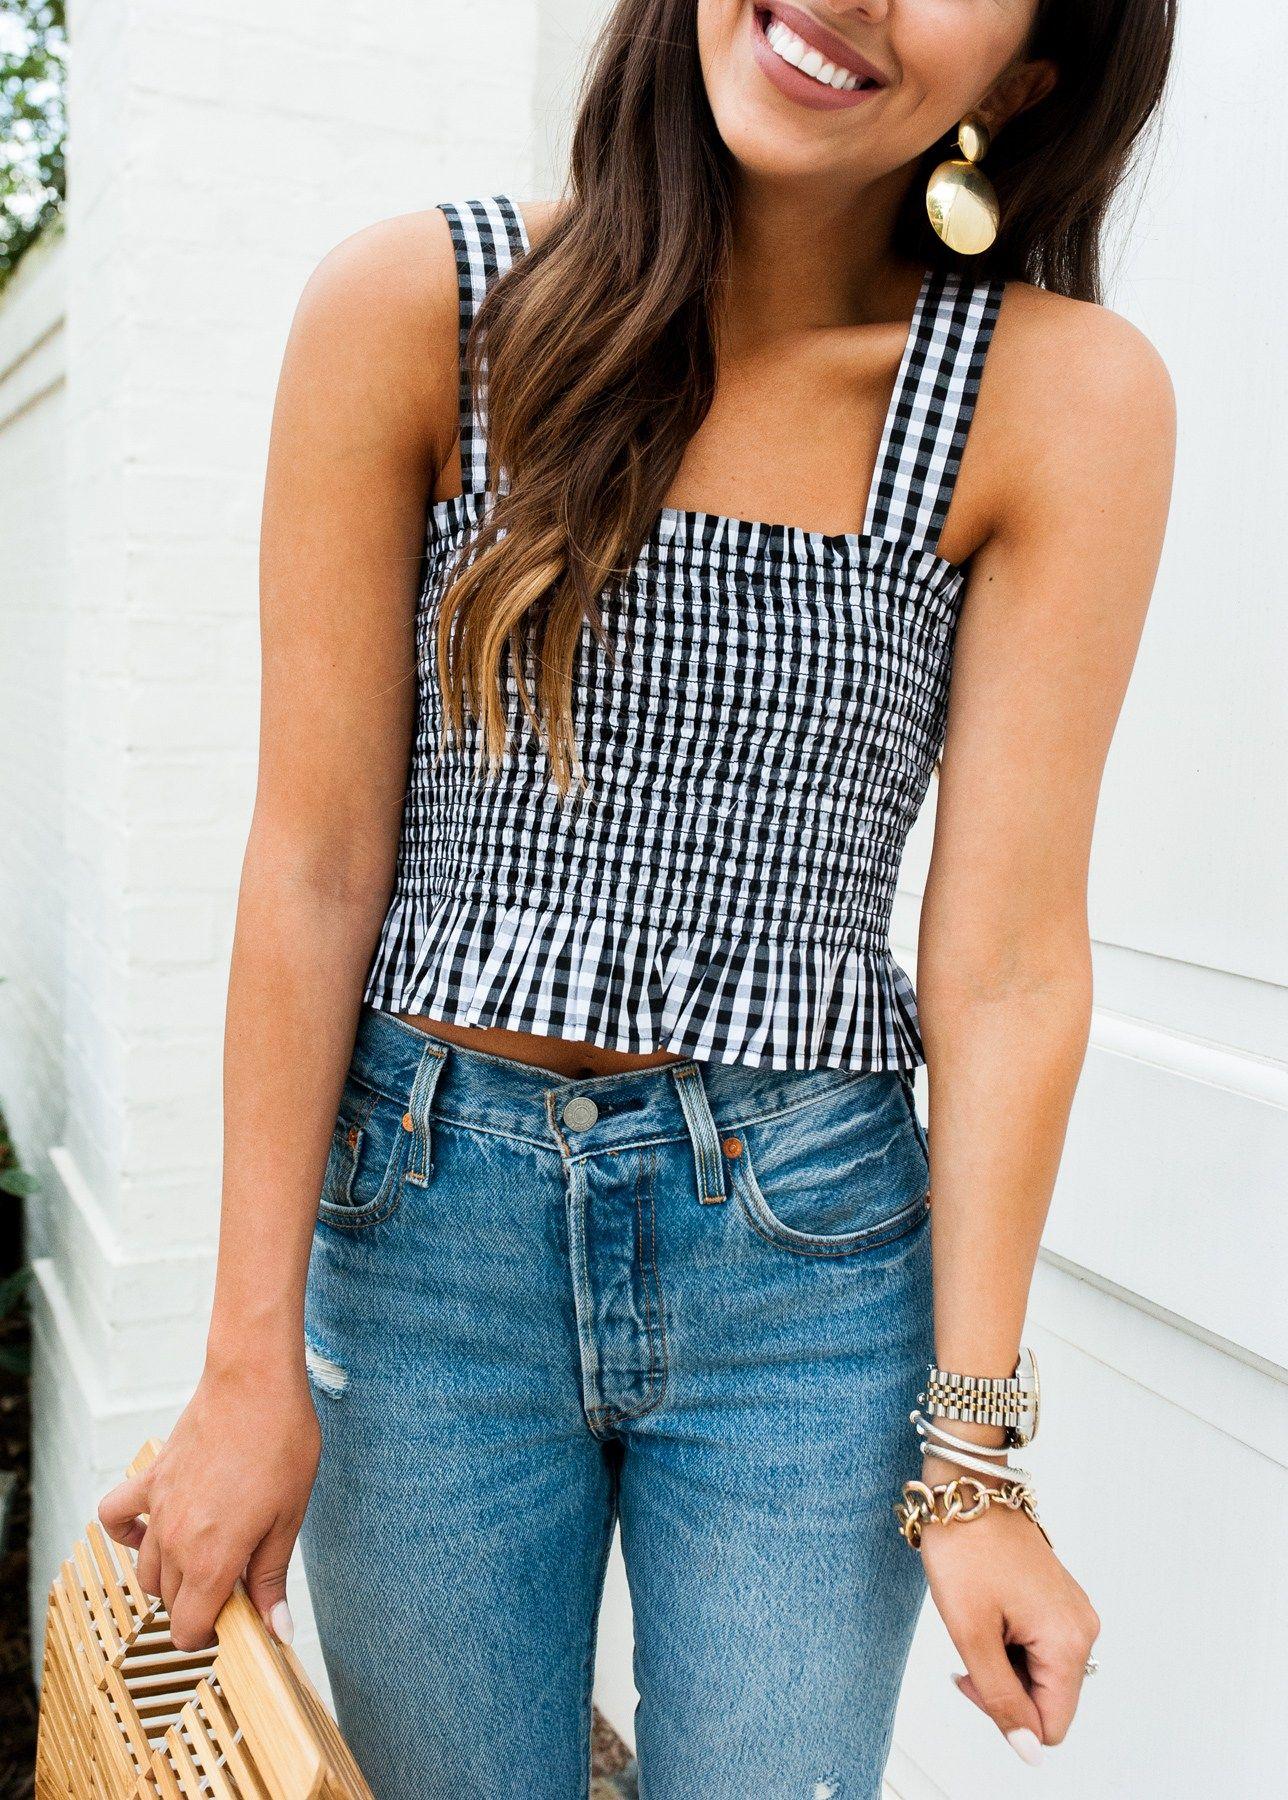 Dress Up Buttercup | Dede Raad | Houston Fashion Blogger | Houston Blog | Fashion Blog